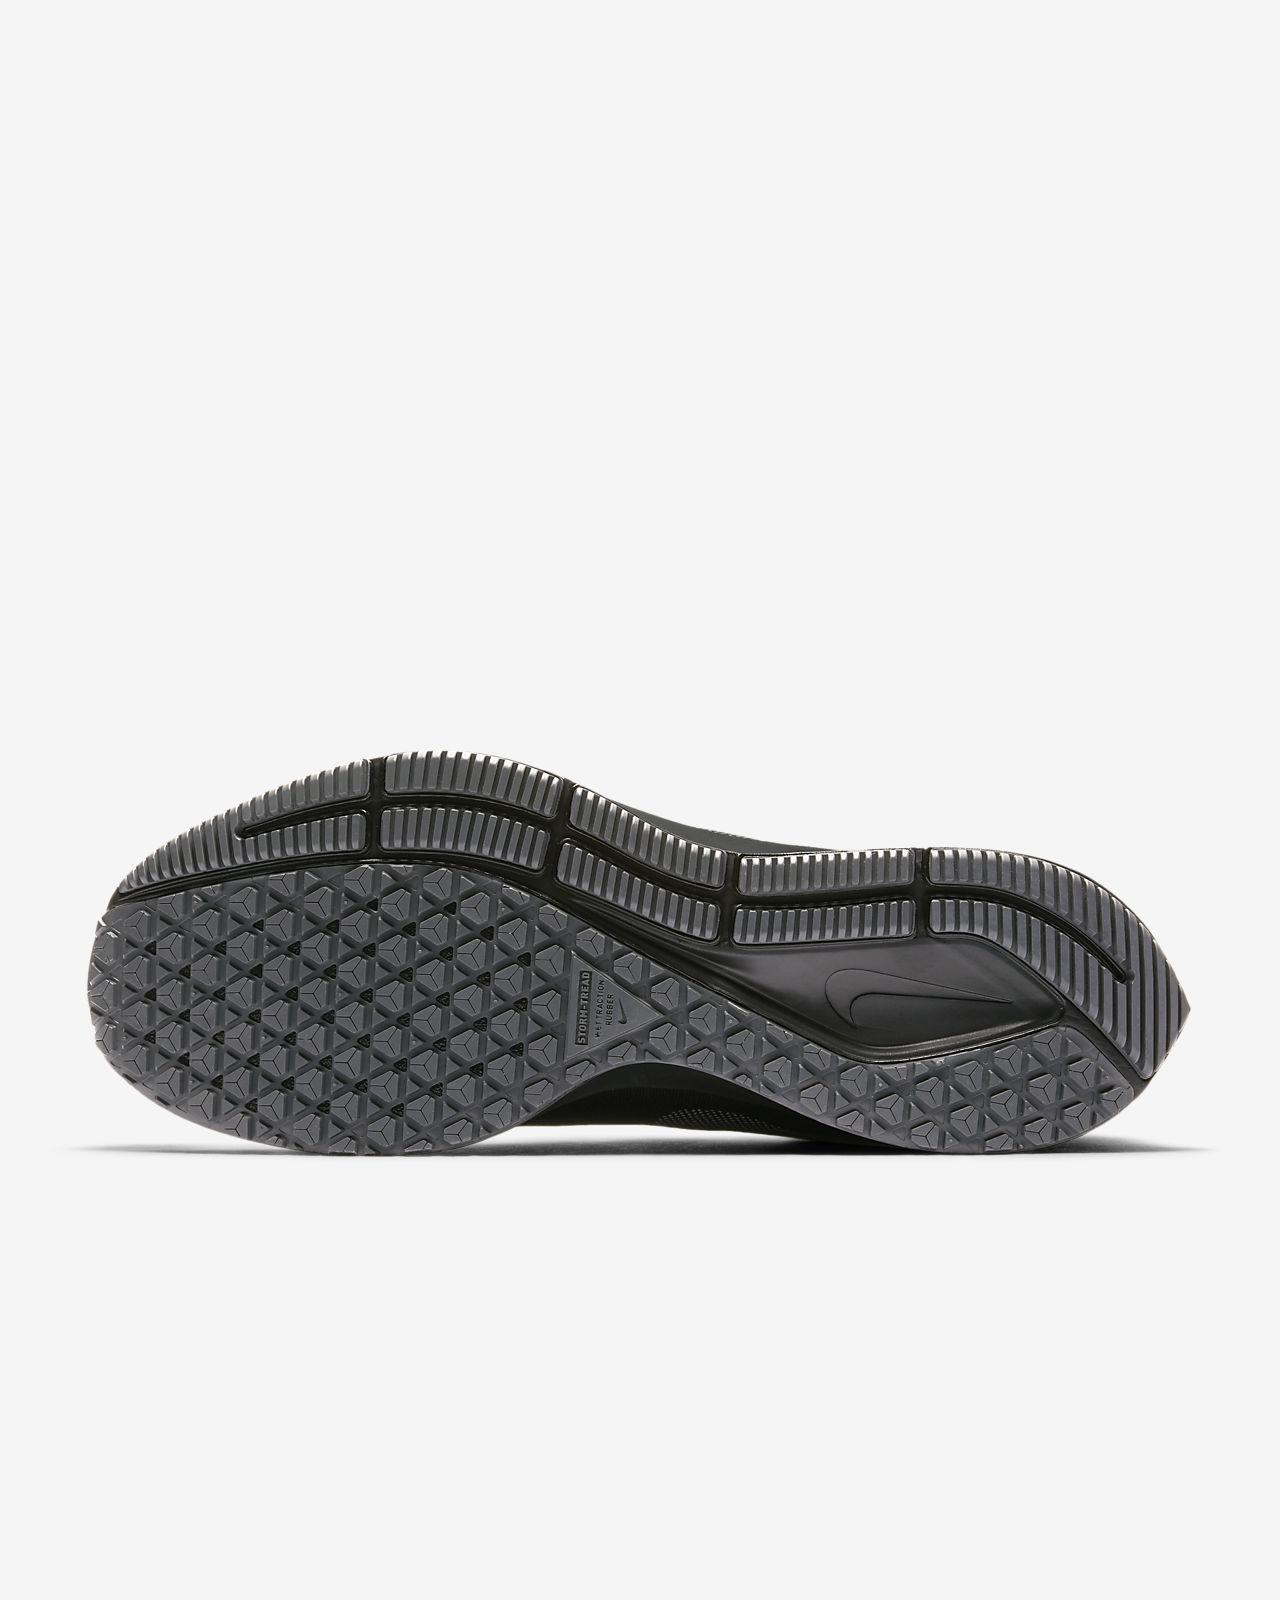 finest selection 5e747 fb060 ... Nike Air Zoom Pegasus 35 Shield Water-Repellent Men s Running Shoe